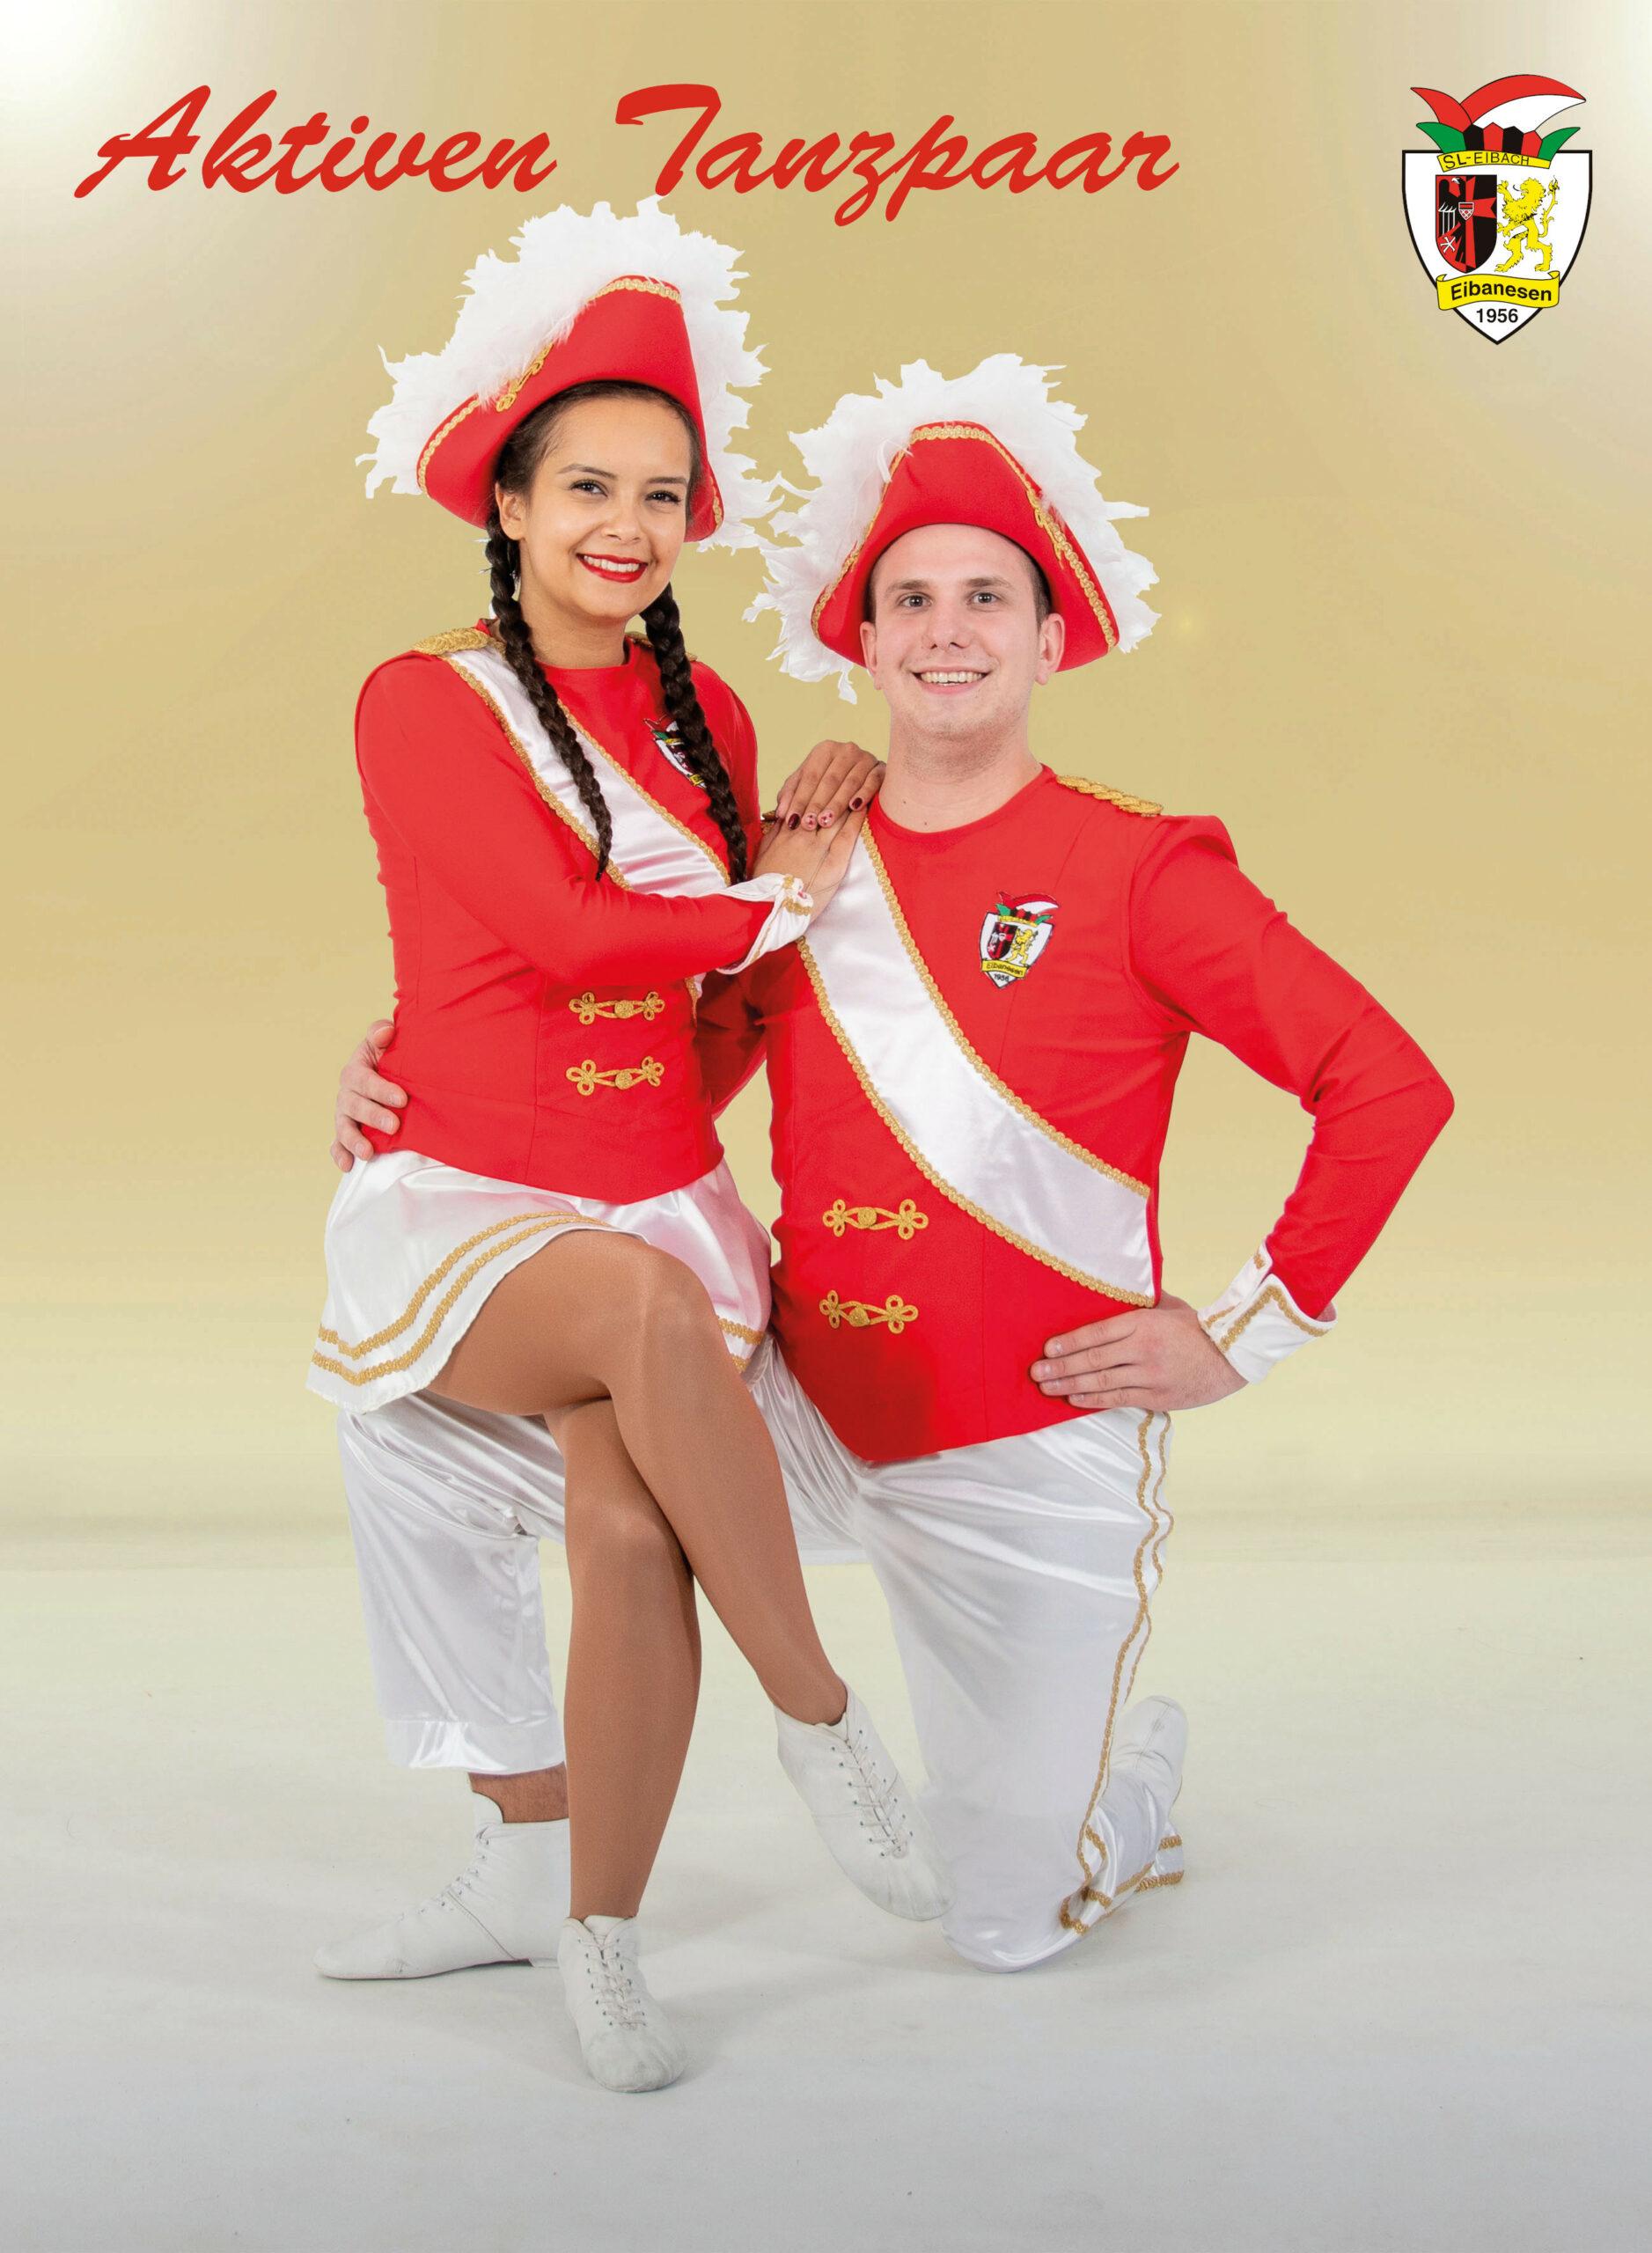 Aktiven-Tanzpaar